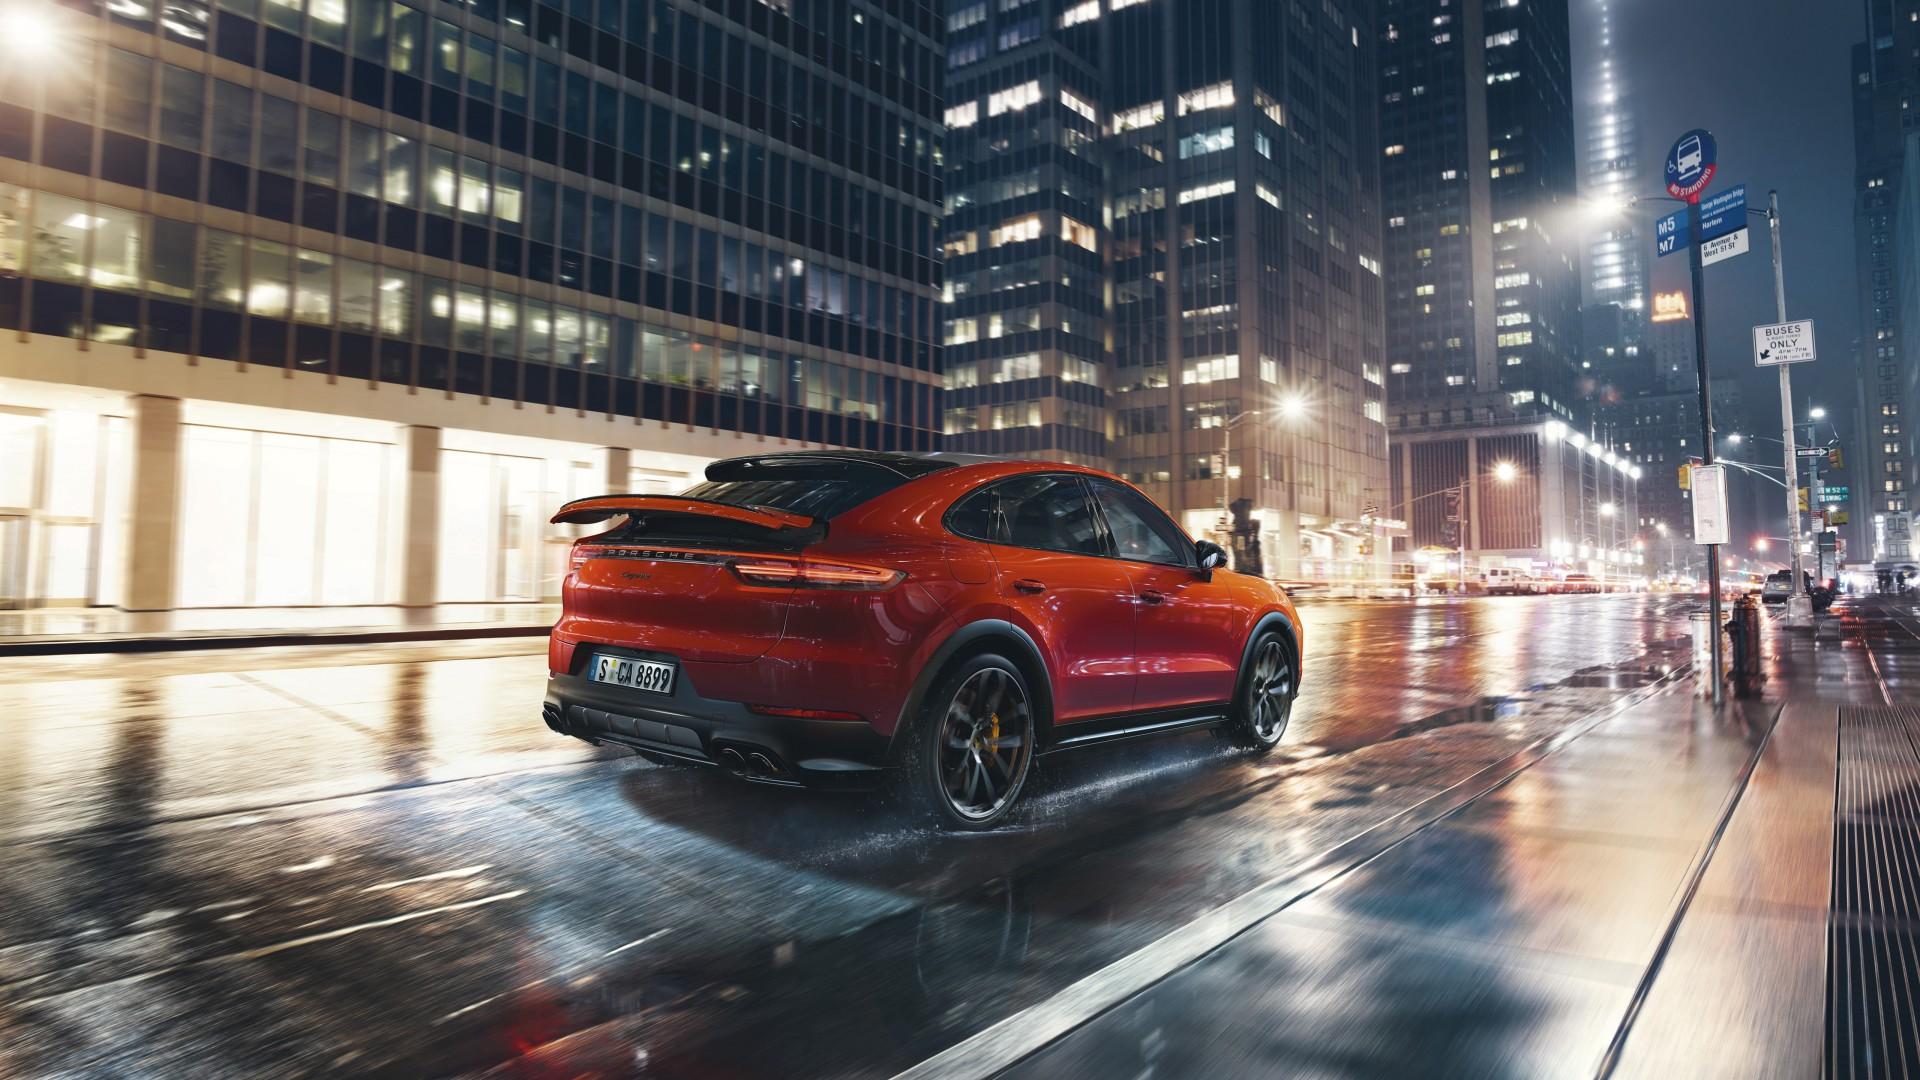 Porsche Cayenne Coupe 2019 4k 4 Wallpaper Hd Car